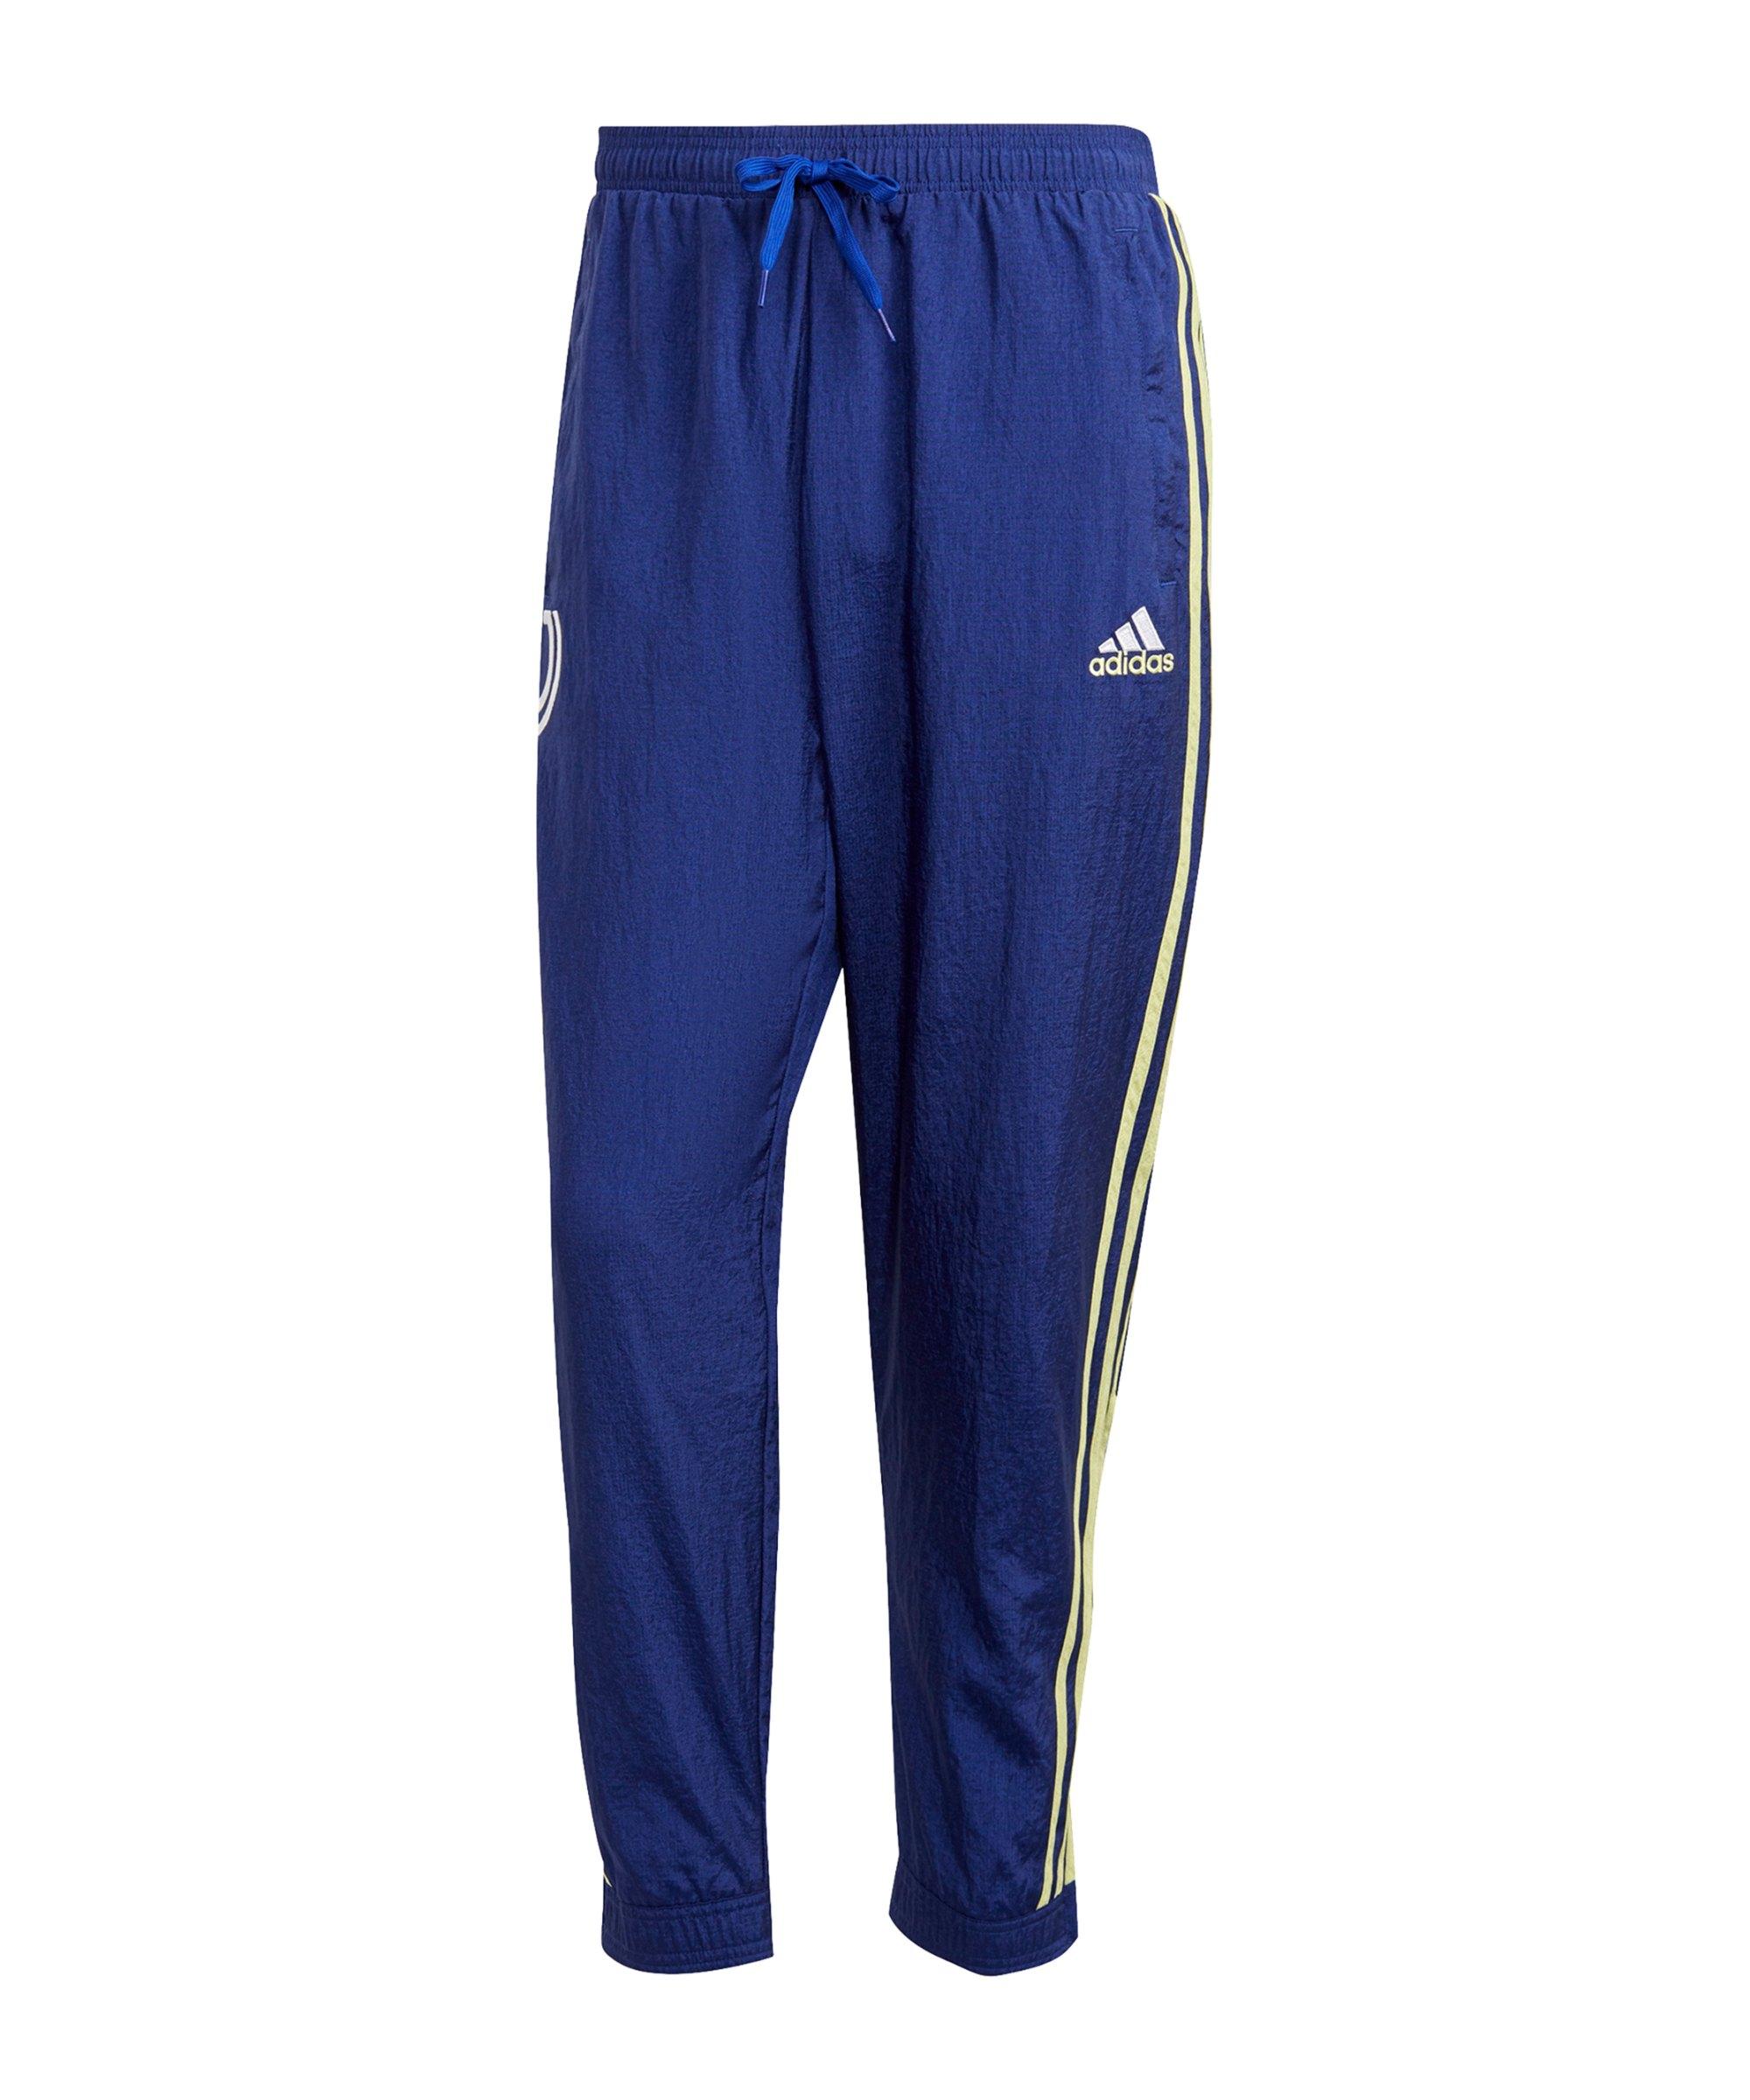 adidas Juventus Turin Icon Woven Jogginghose Blau Gelb - blau